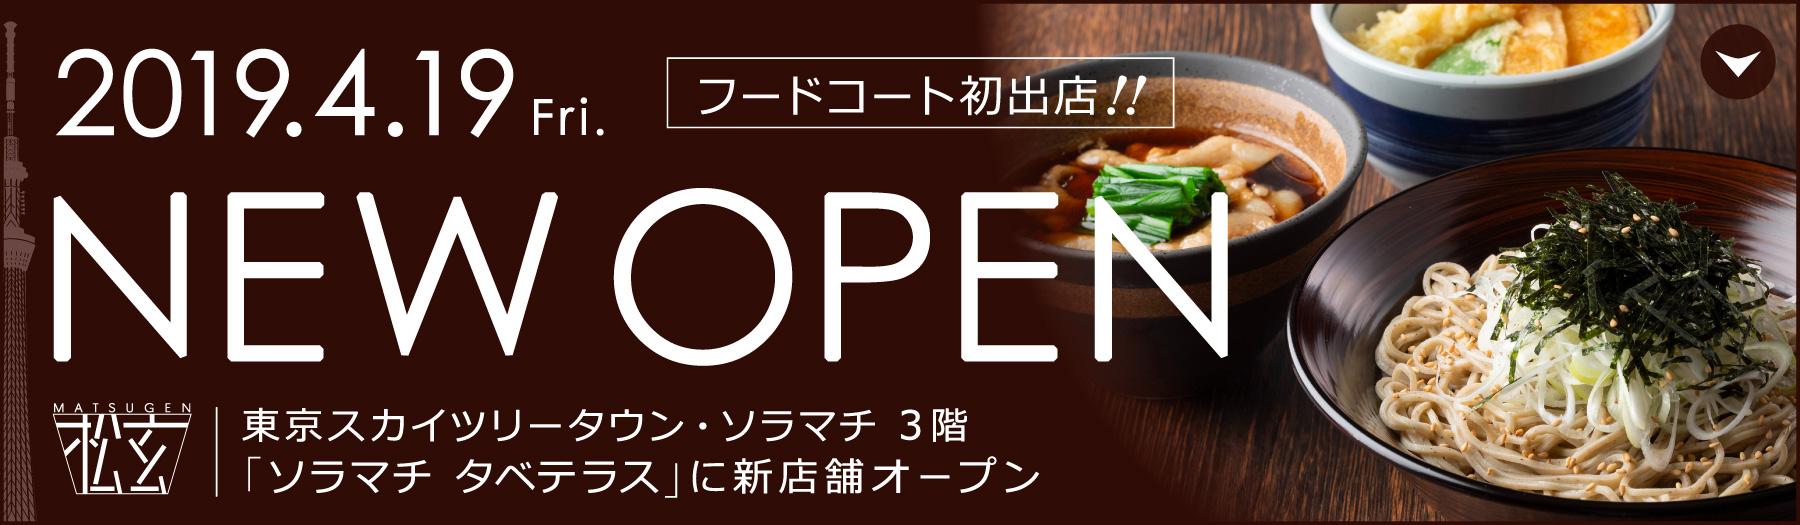 bnr_matsugen_sky_open.jpg